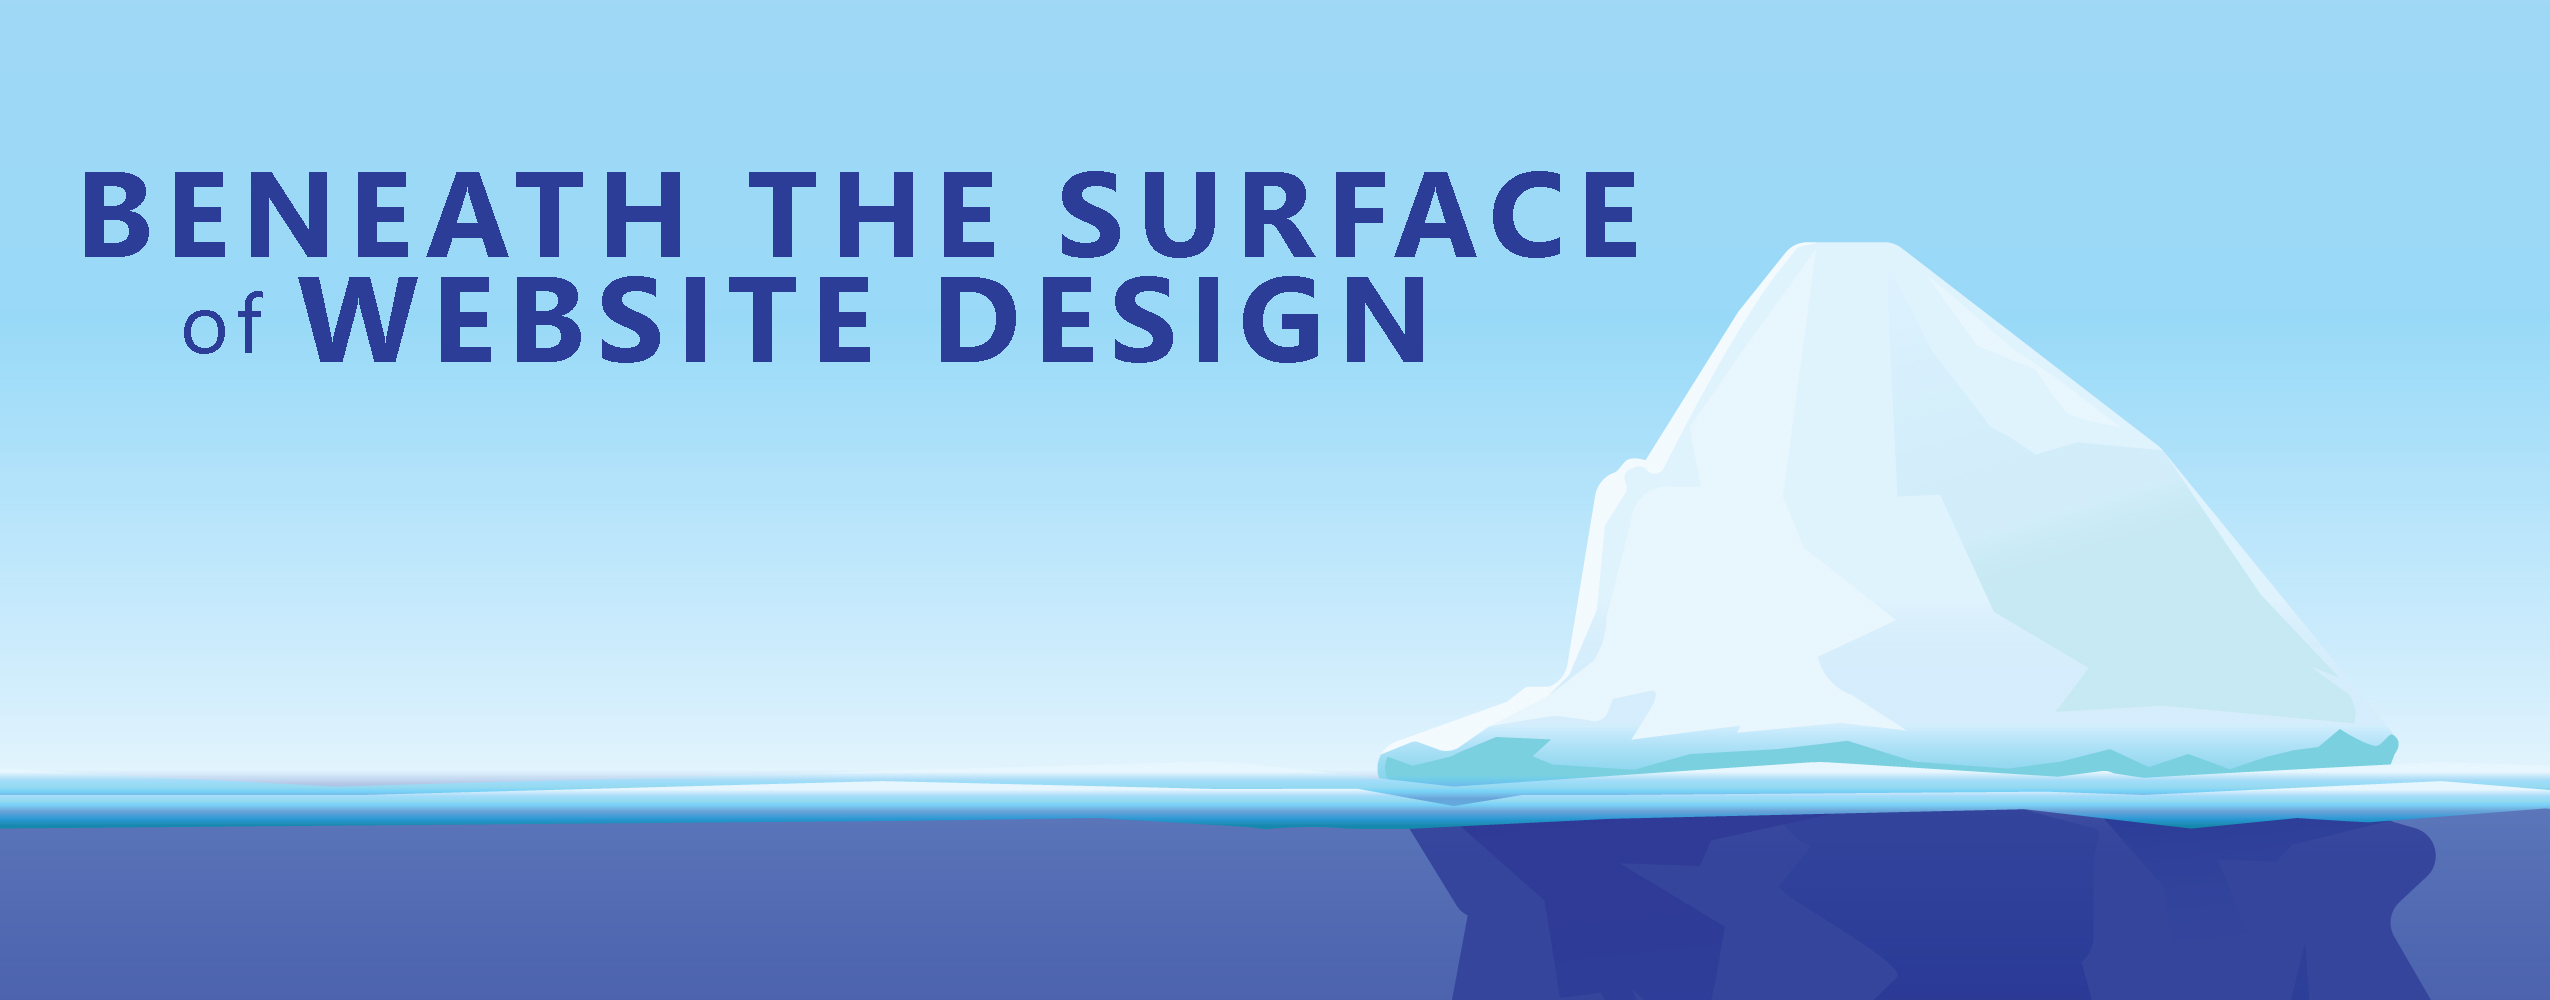 website design below the surface